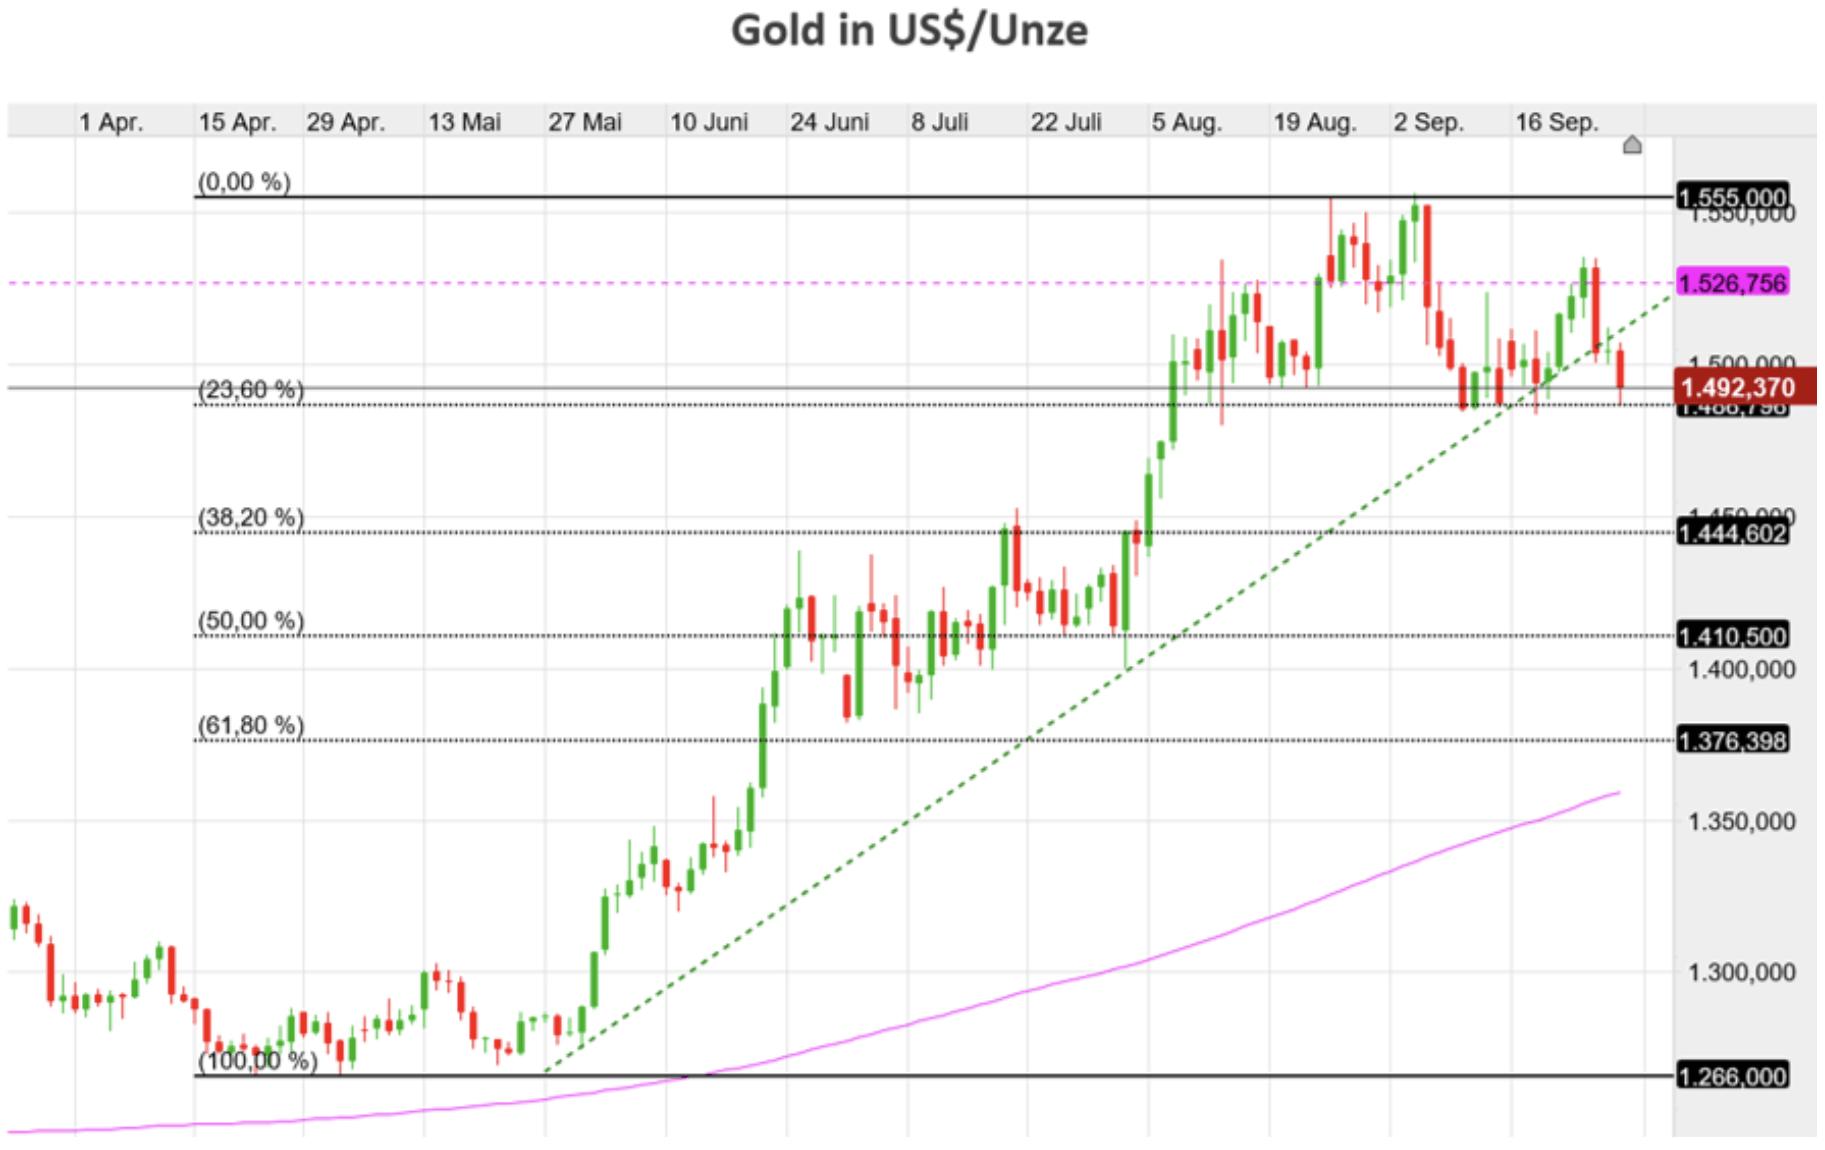 Goldpreis in US-Dollar